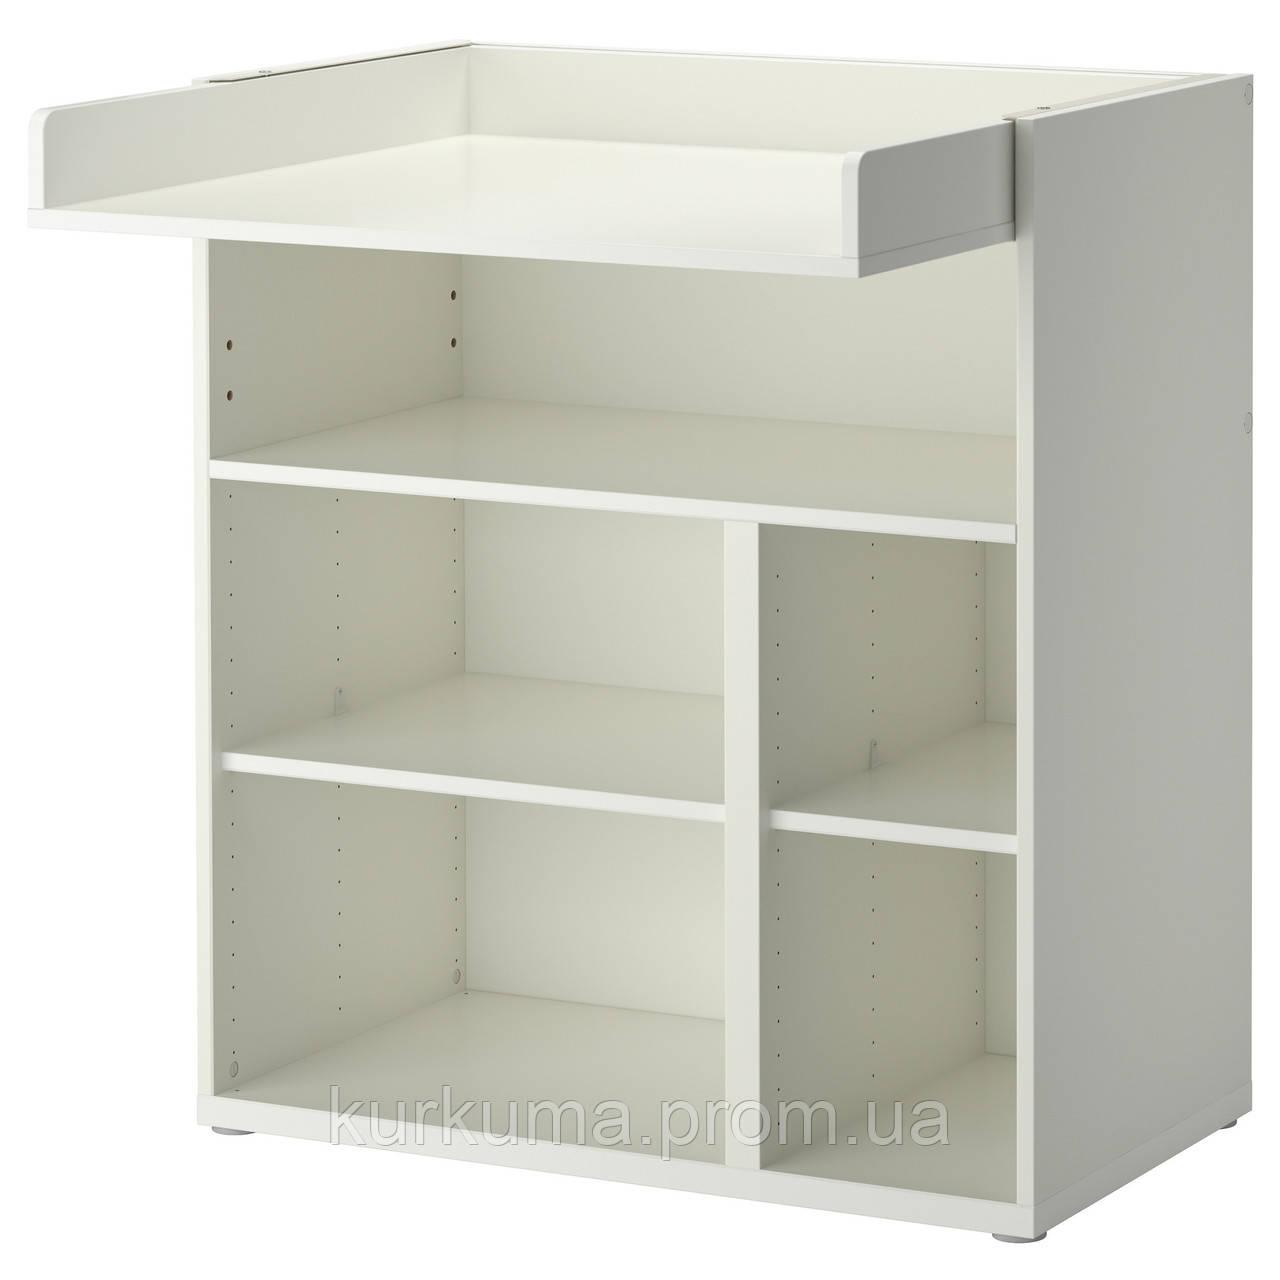 Ikea Stuva пеленальный стол письменный стол белый 20225334